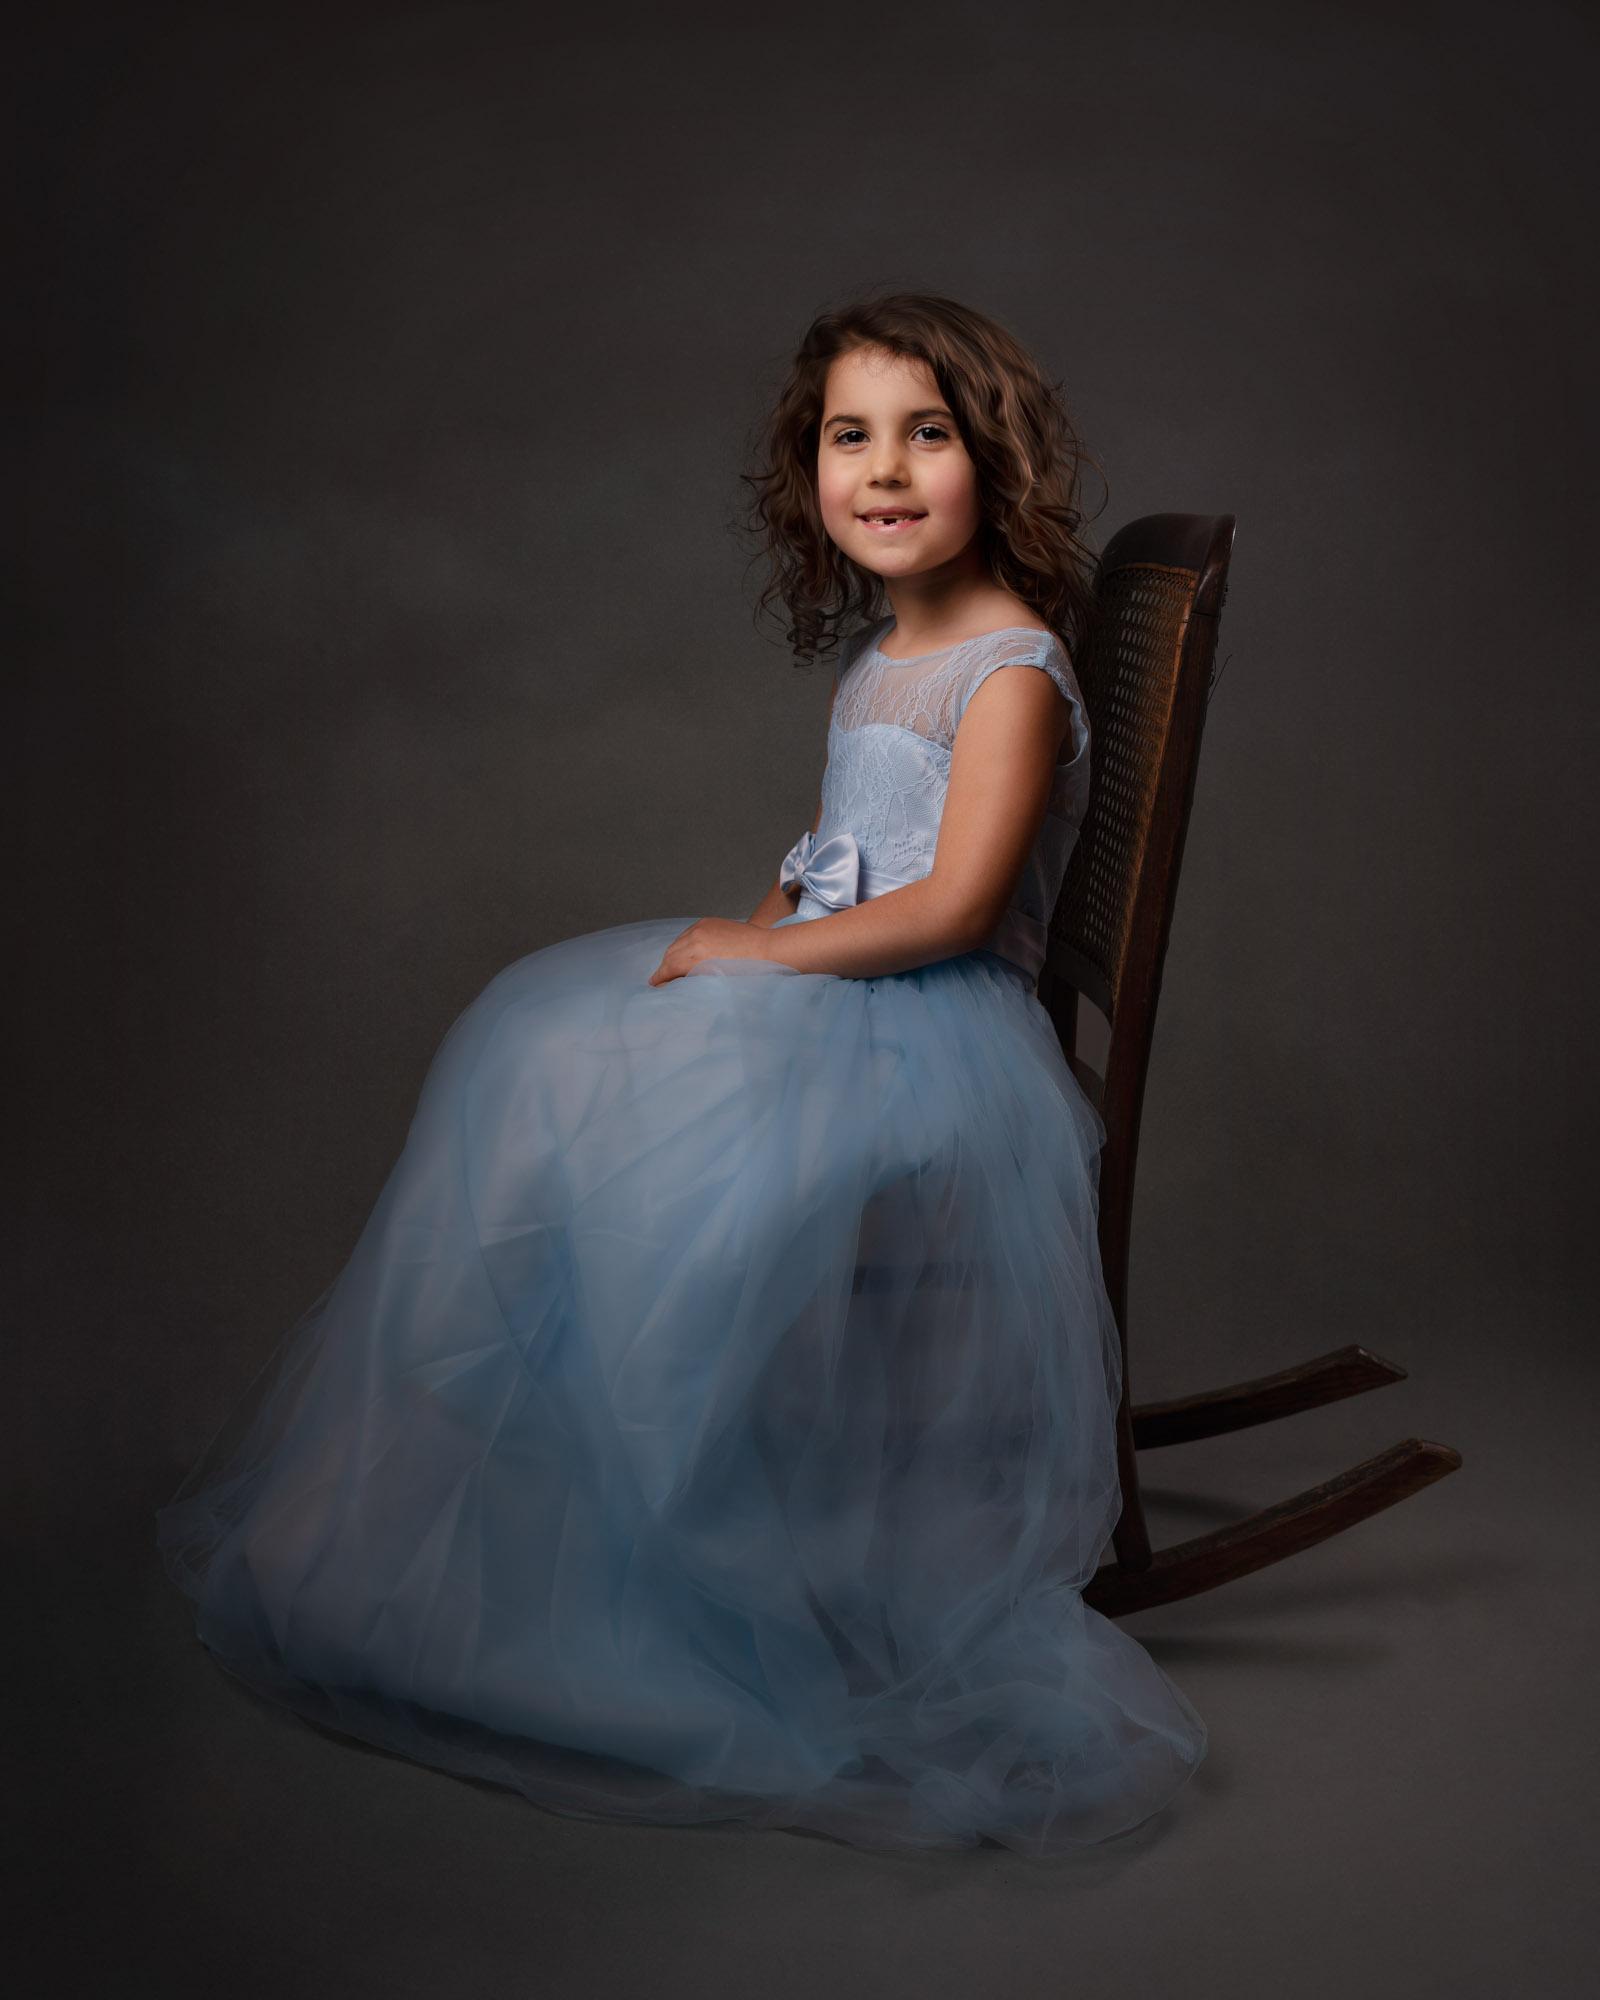 lisa-scott-photography-90